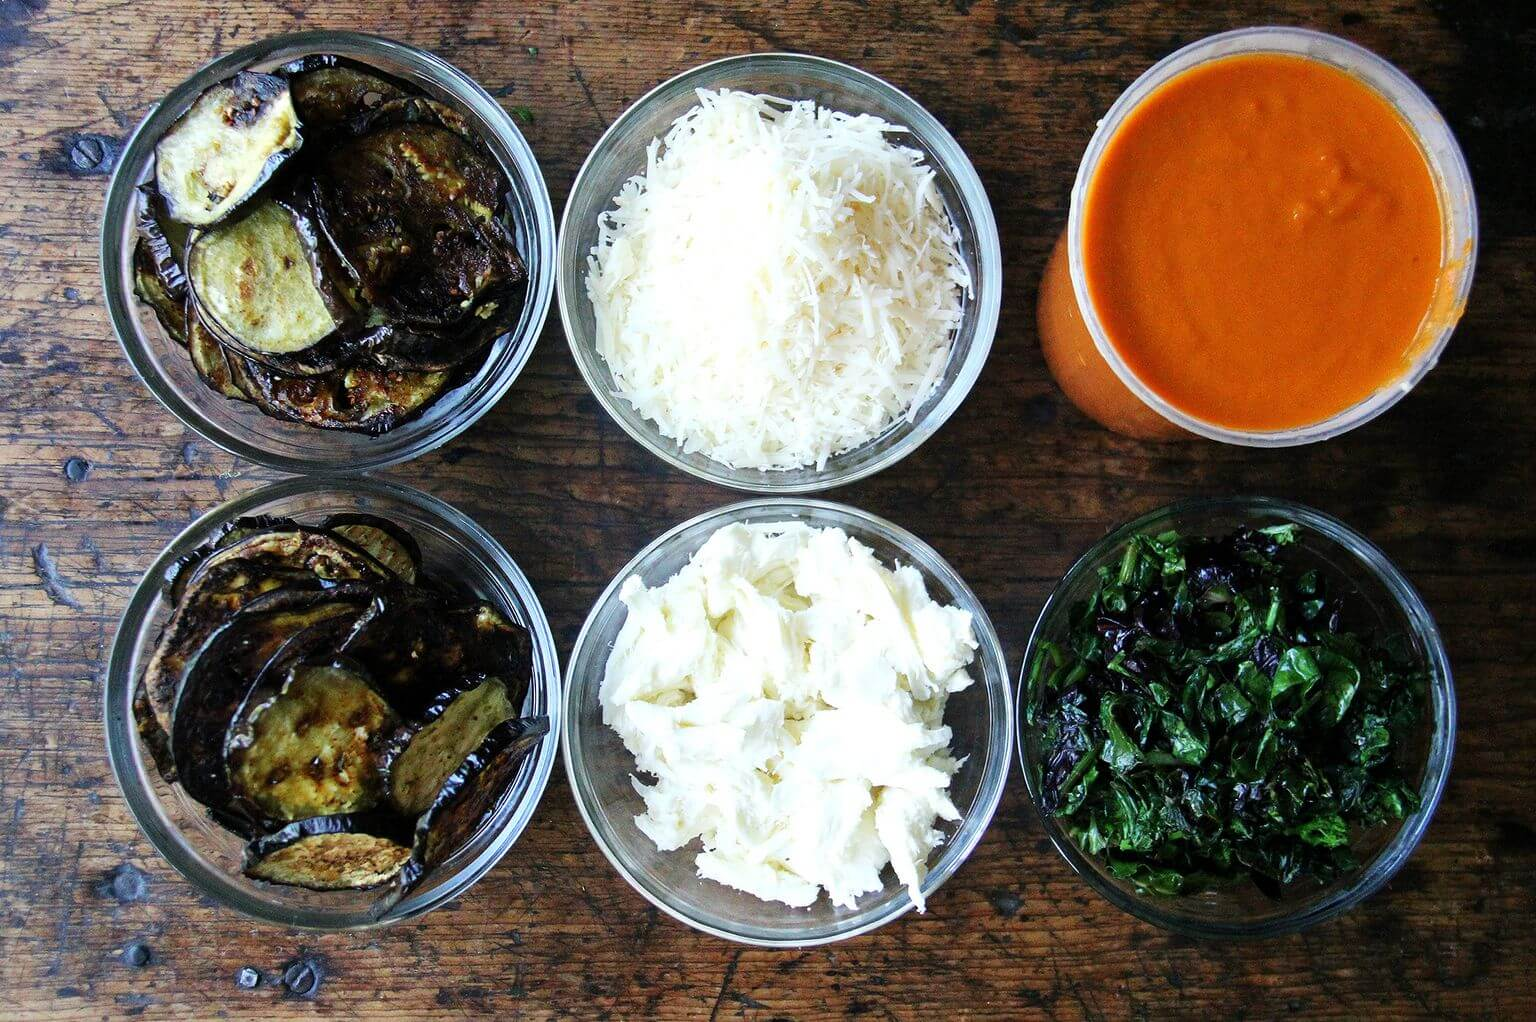 ingredients for eggplant lasagna